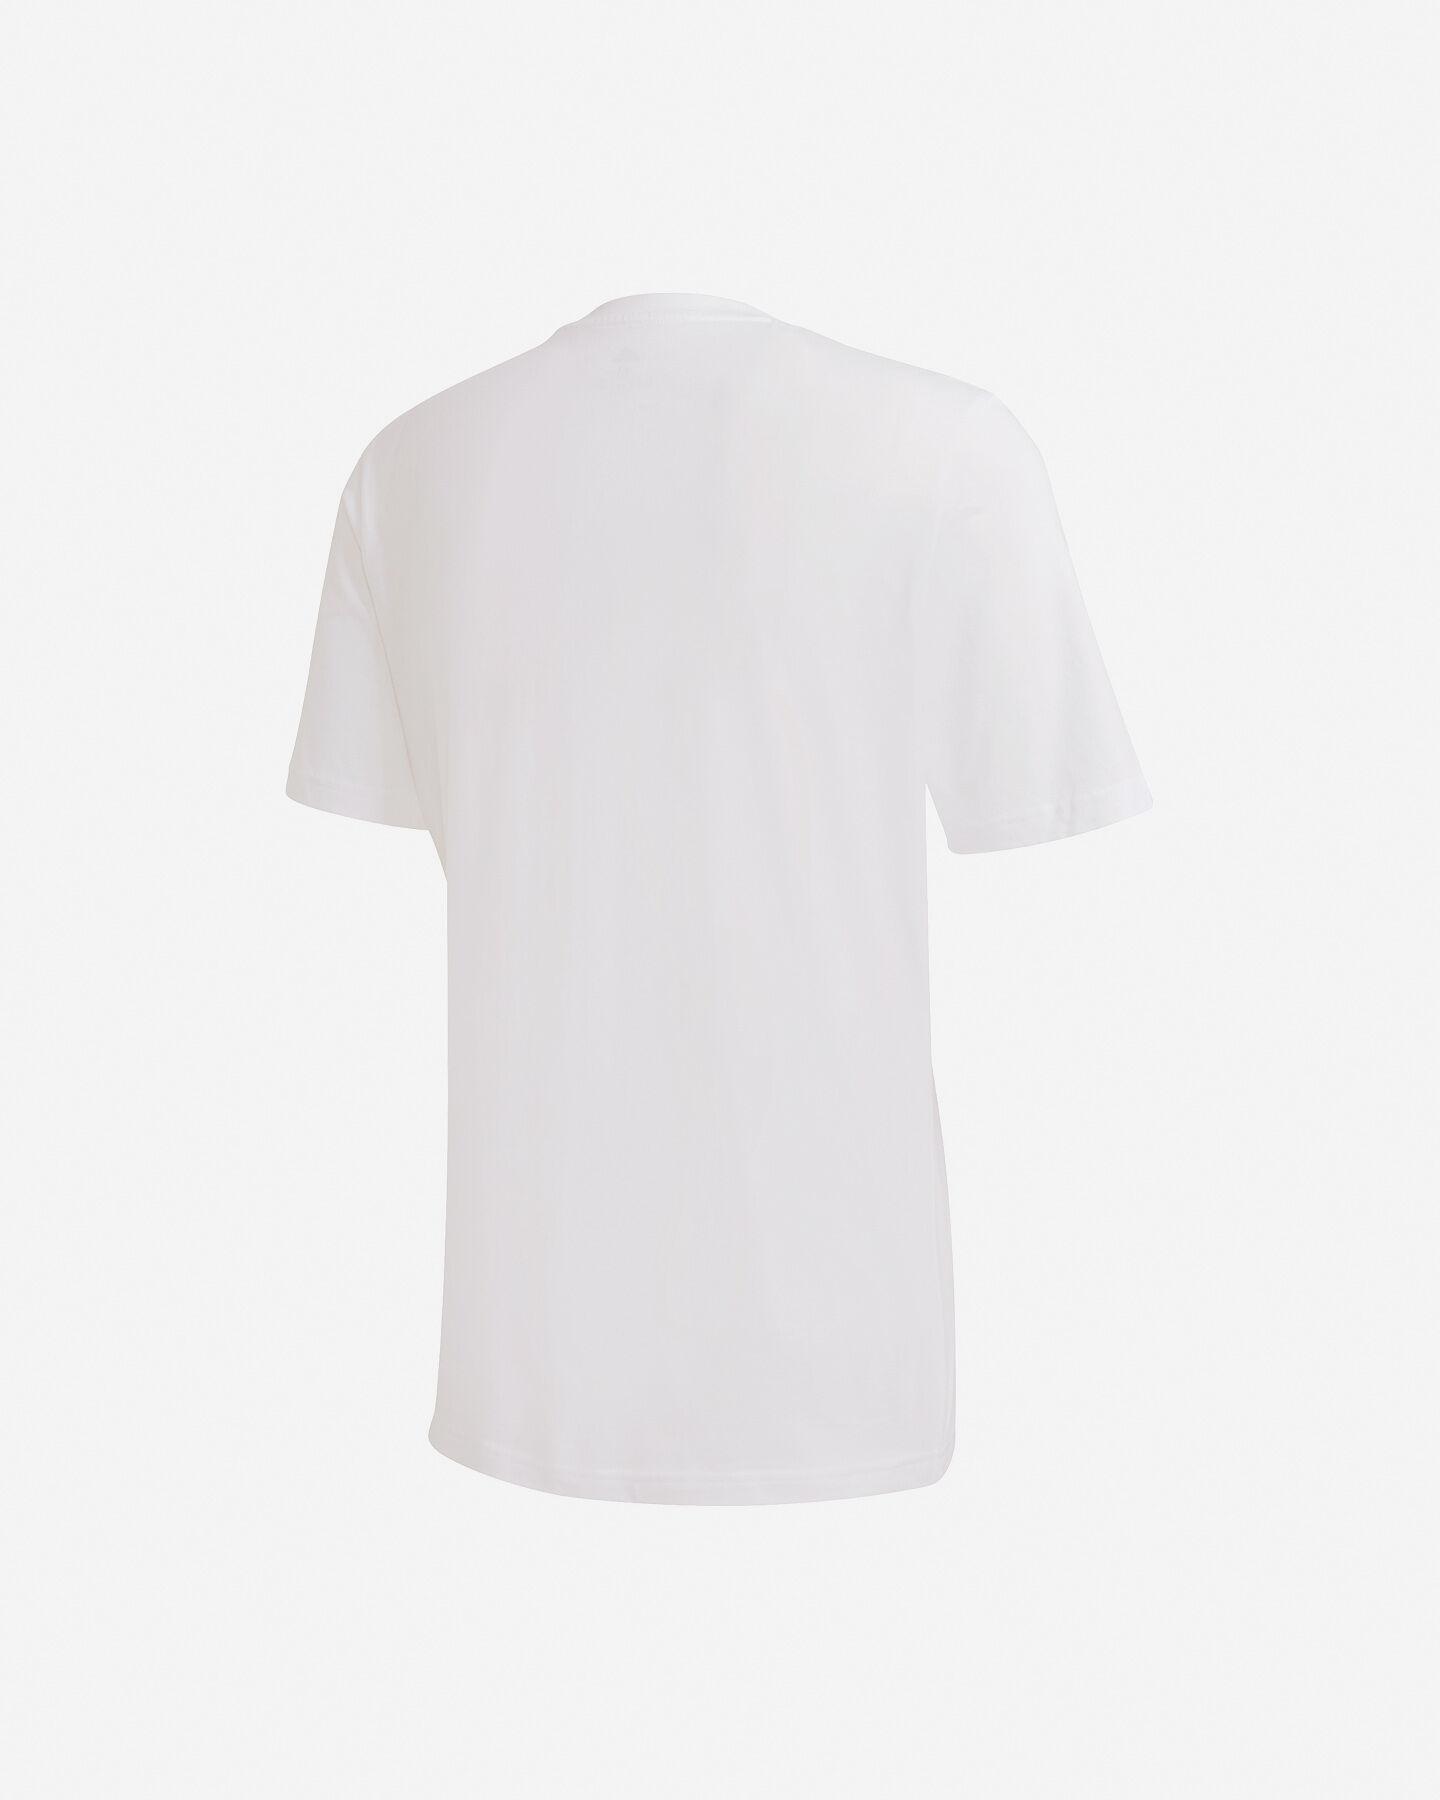 T-Shirt ADIDAS URBAN BIG LOGO M S5211985 scatto 1